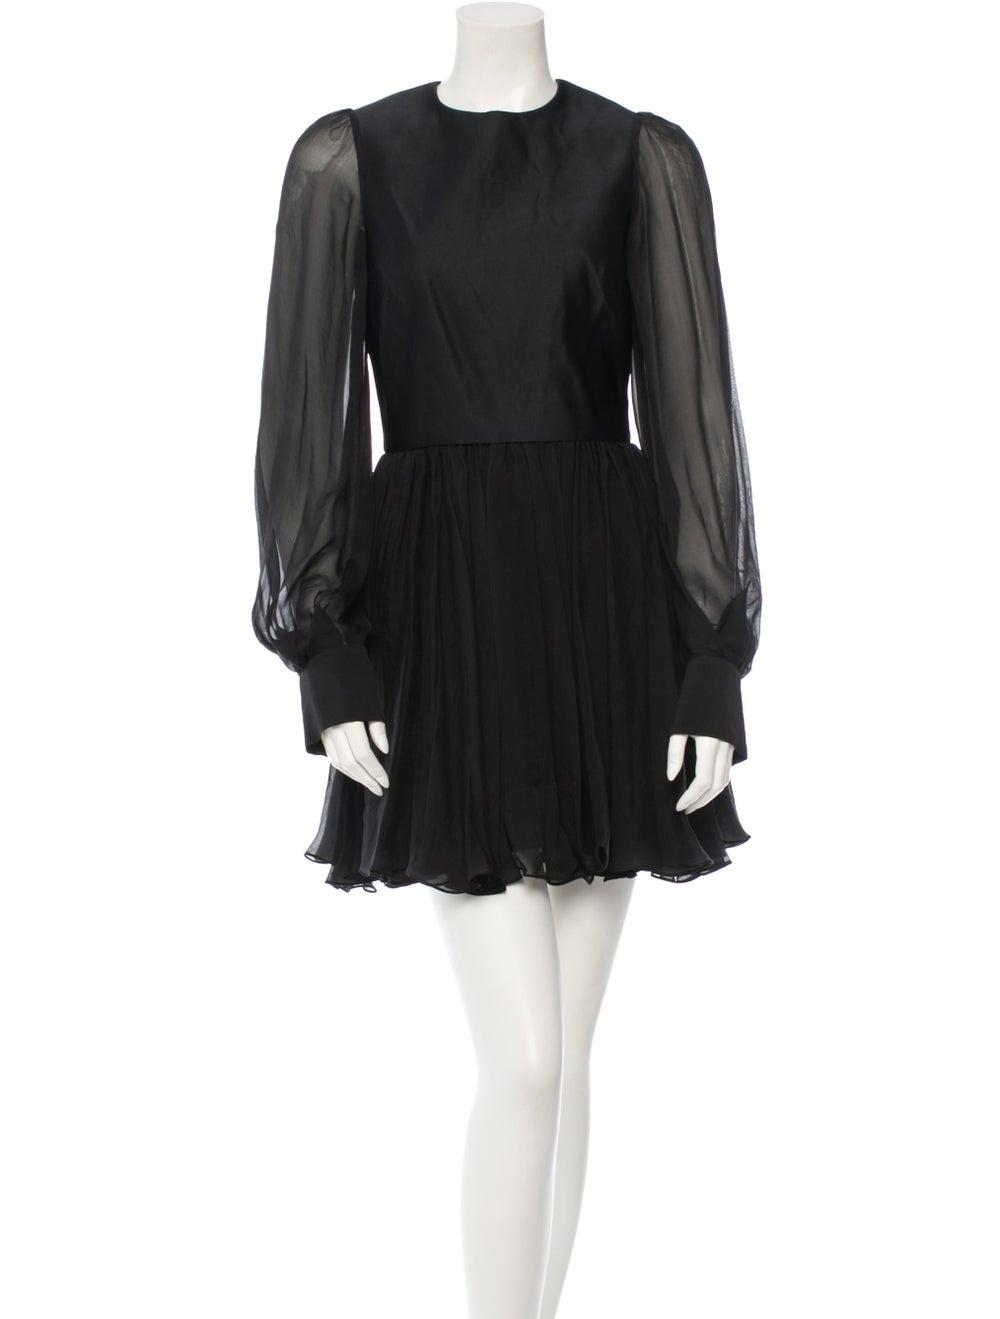 Plein Sud Silk Dress Black - image 1